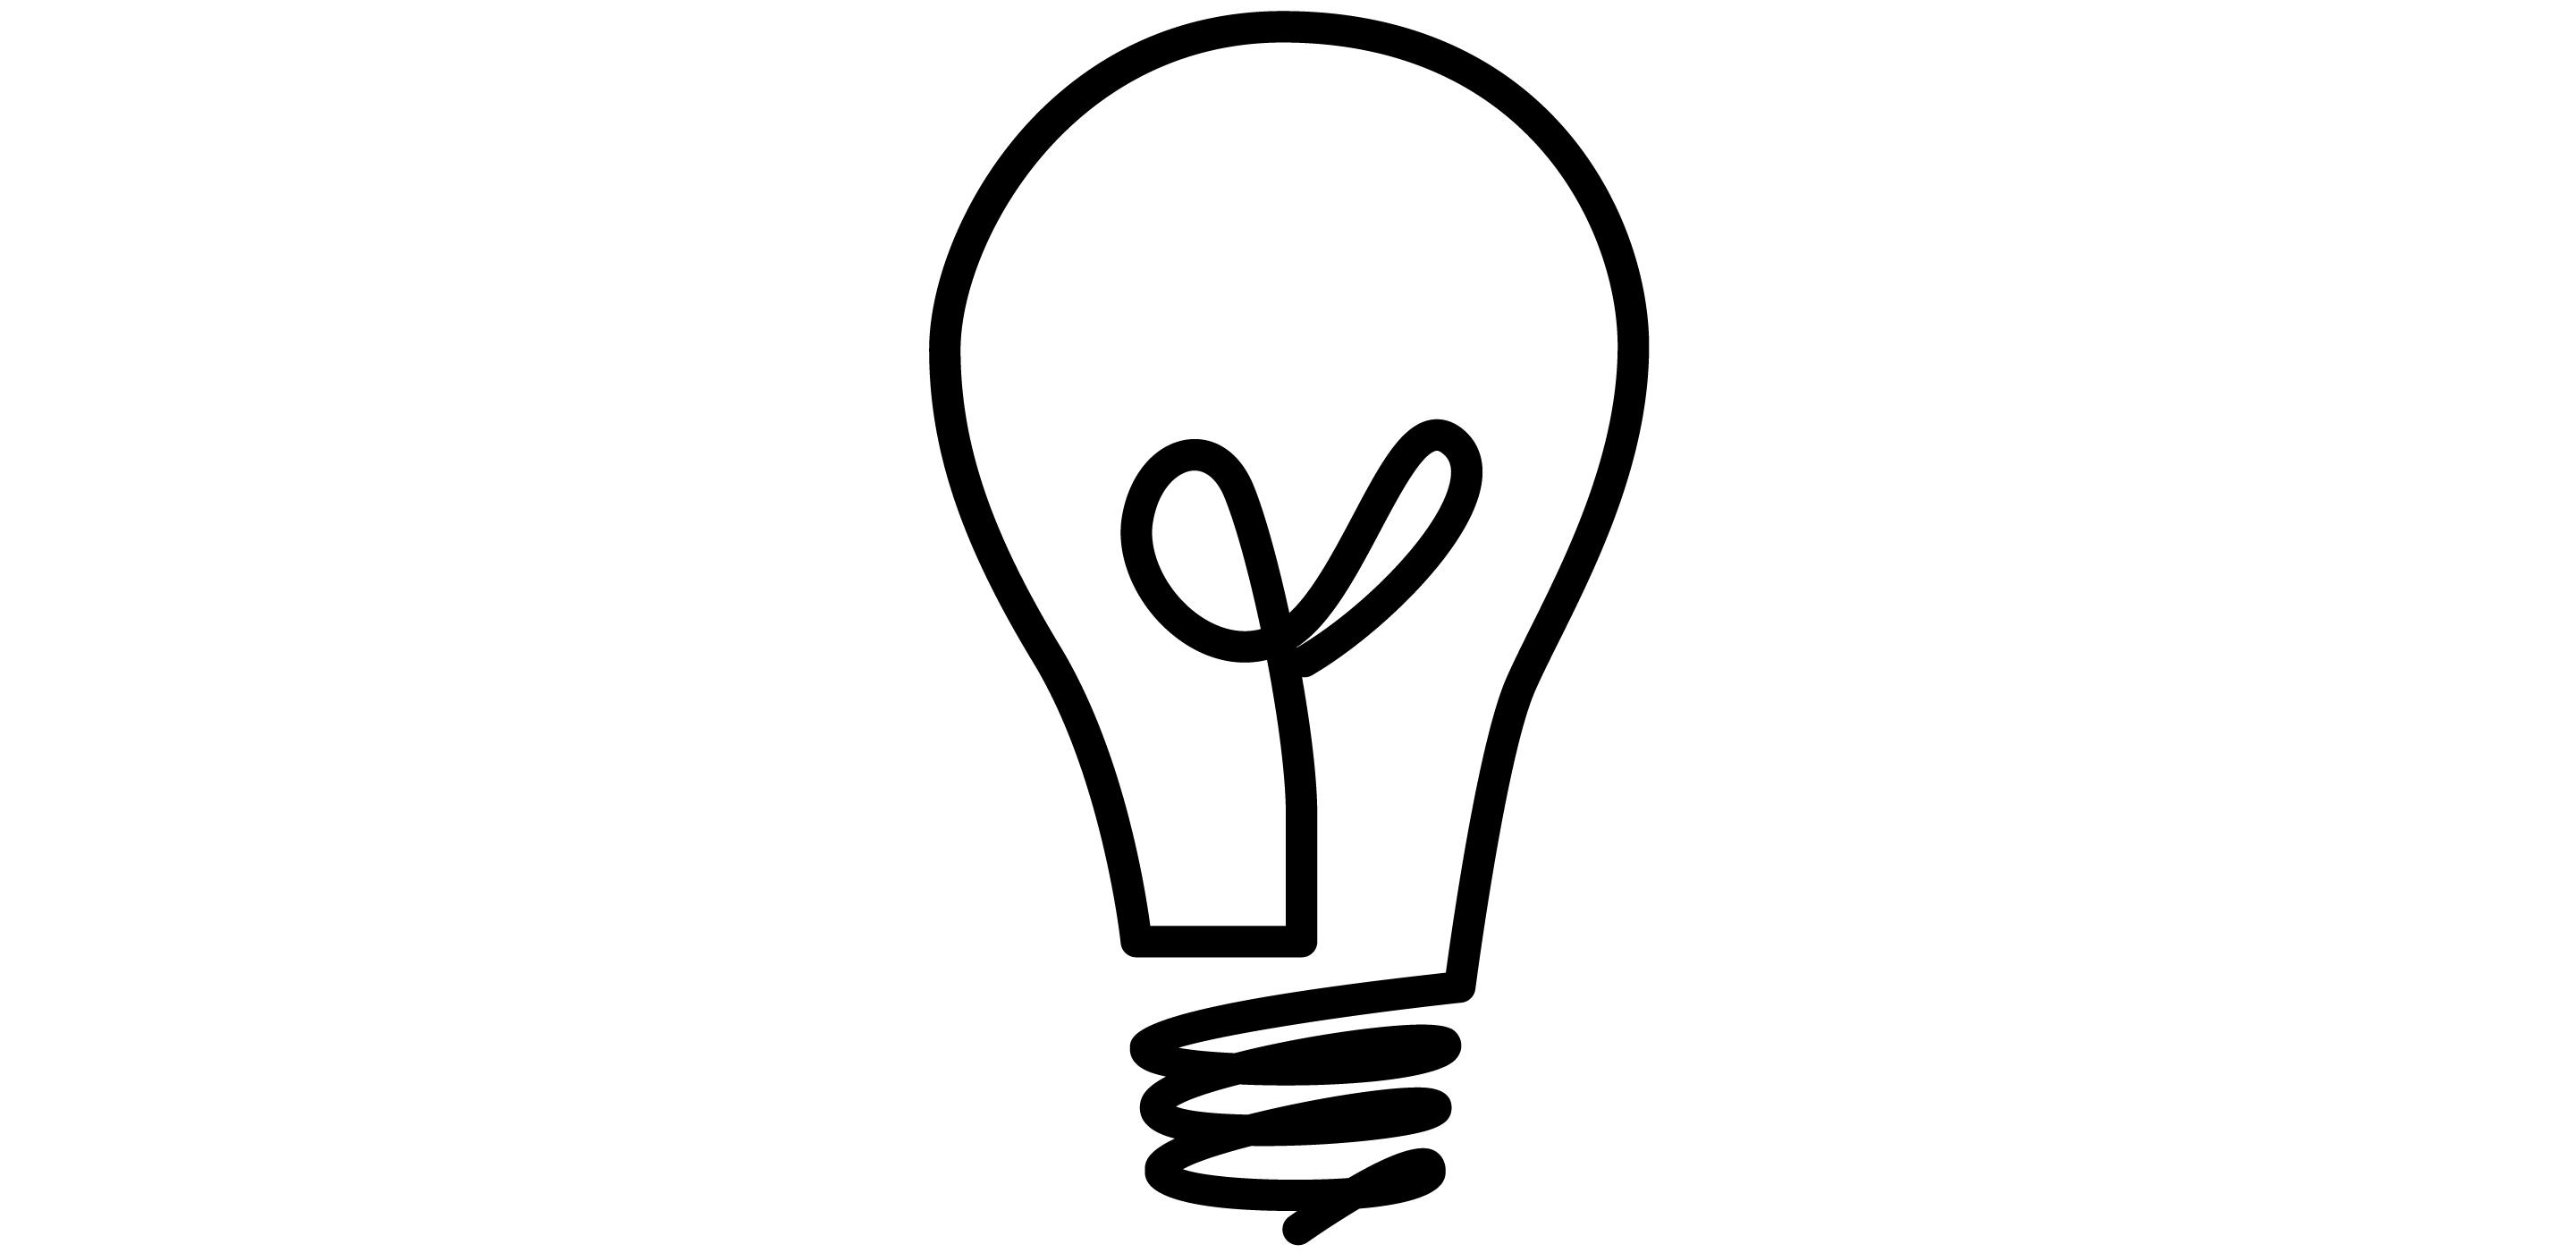 2881x1401 Lightbulb Light Bulb Clipart Free Clip Art Images Image 1